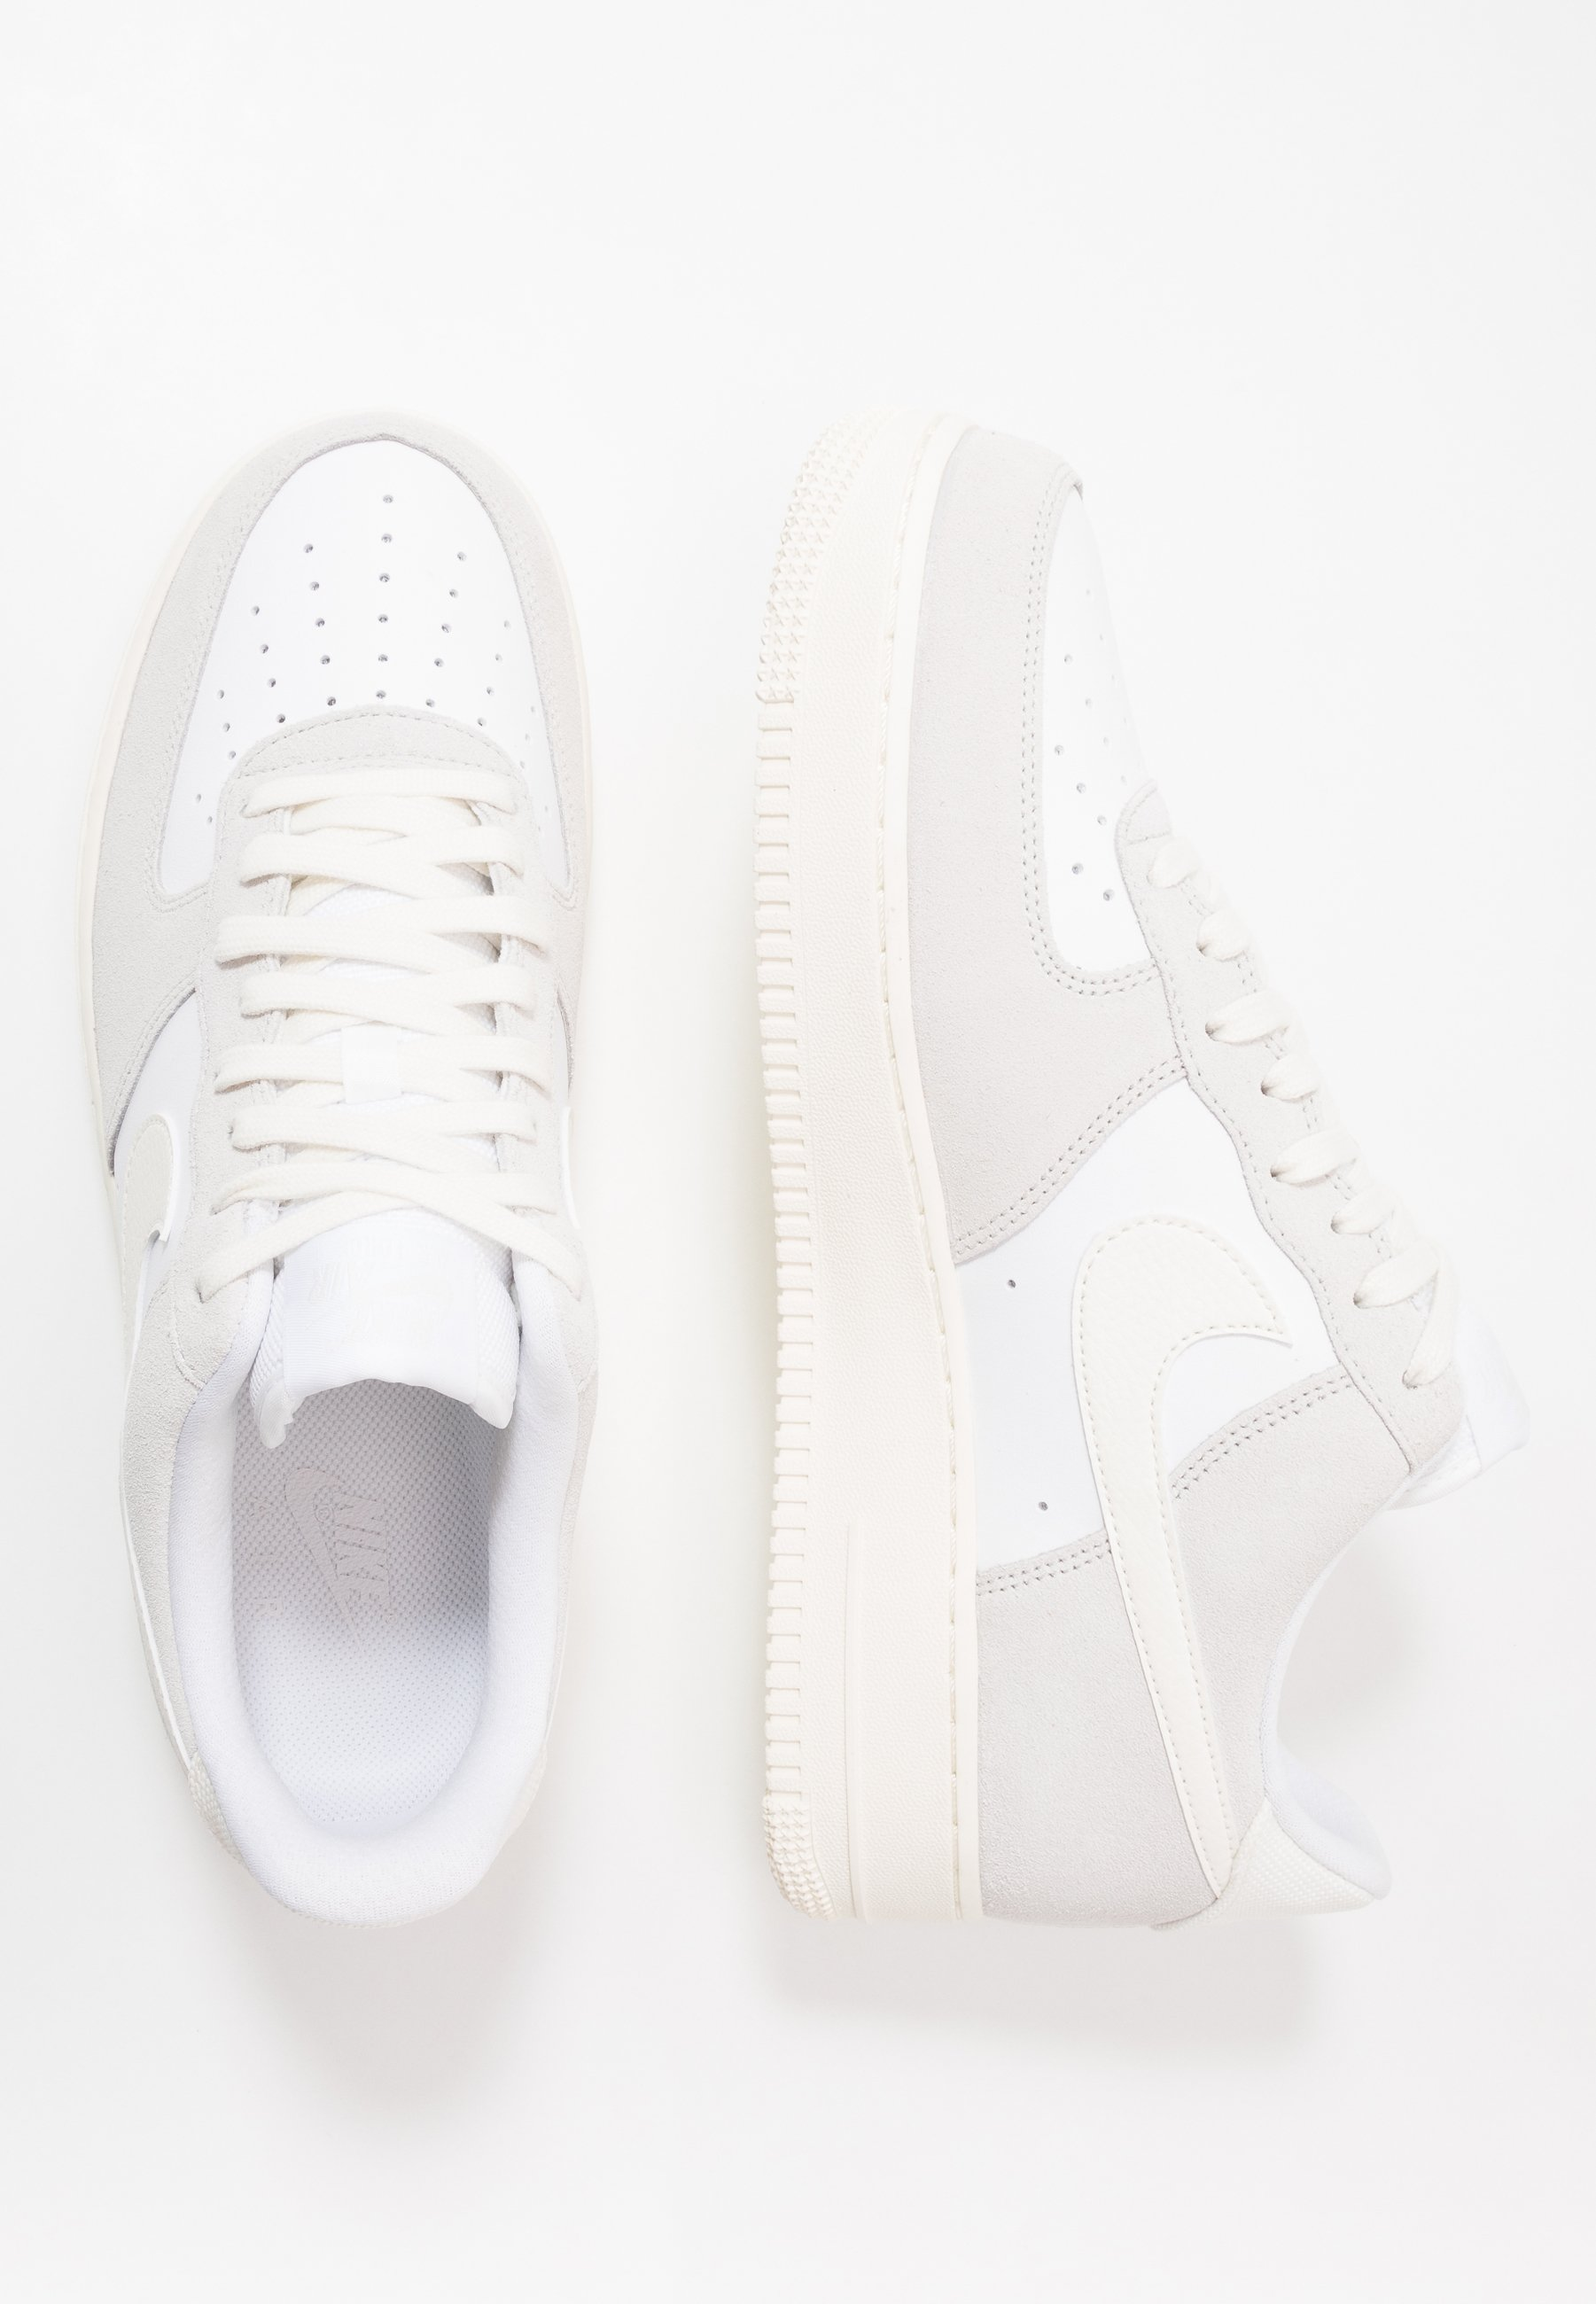 Nike Sportswear Air Force 1 Lv8 - Sneakers Basse White/sail/platinum Tint ikA5SJp